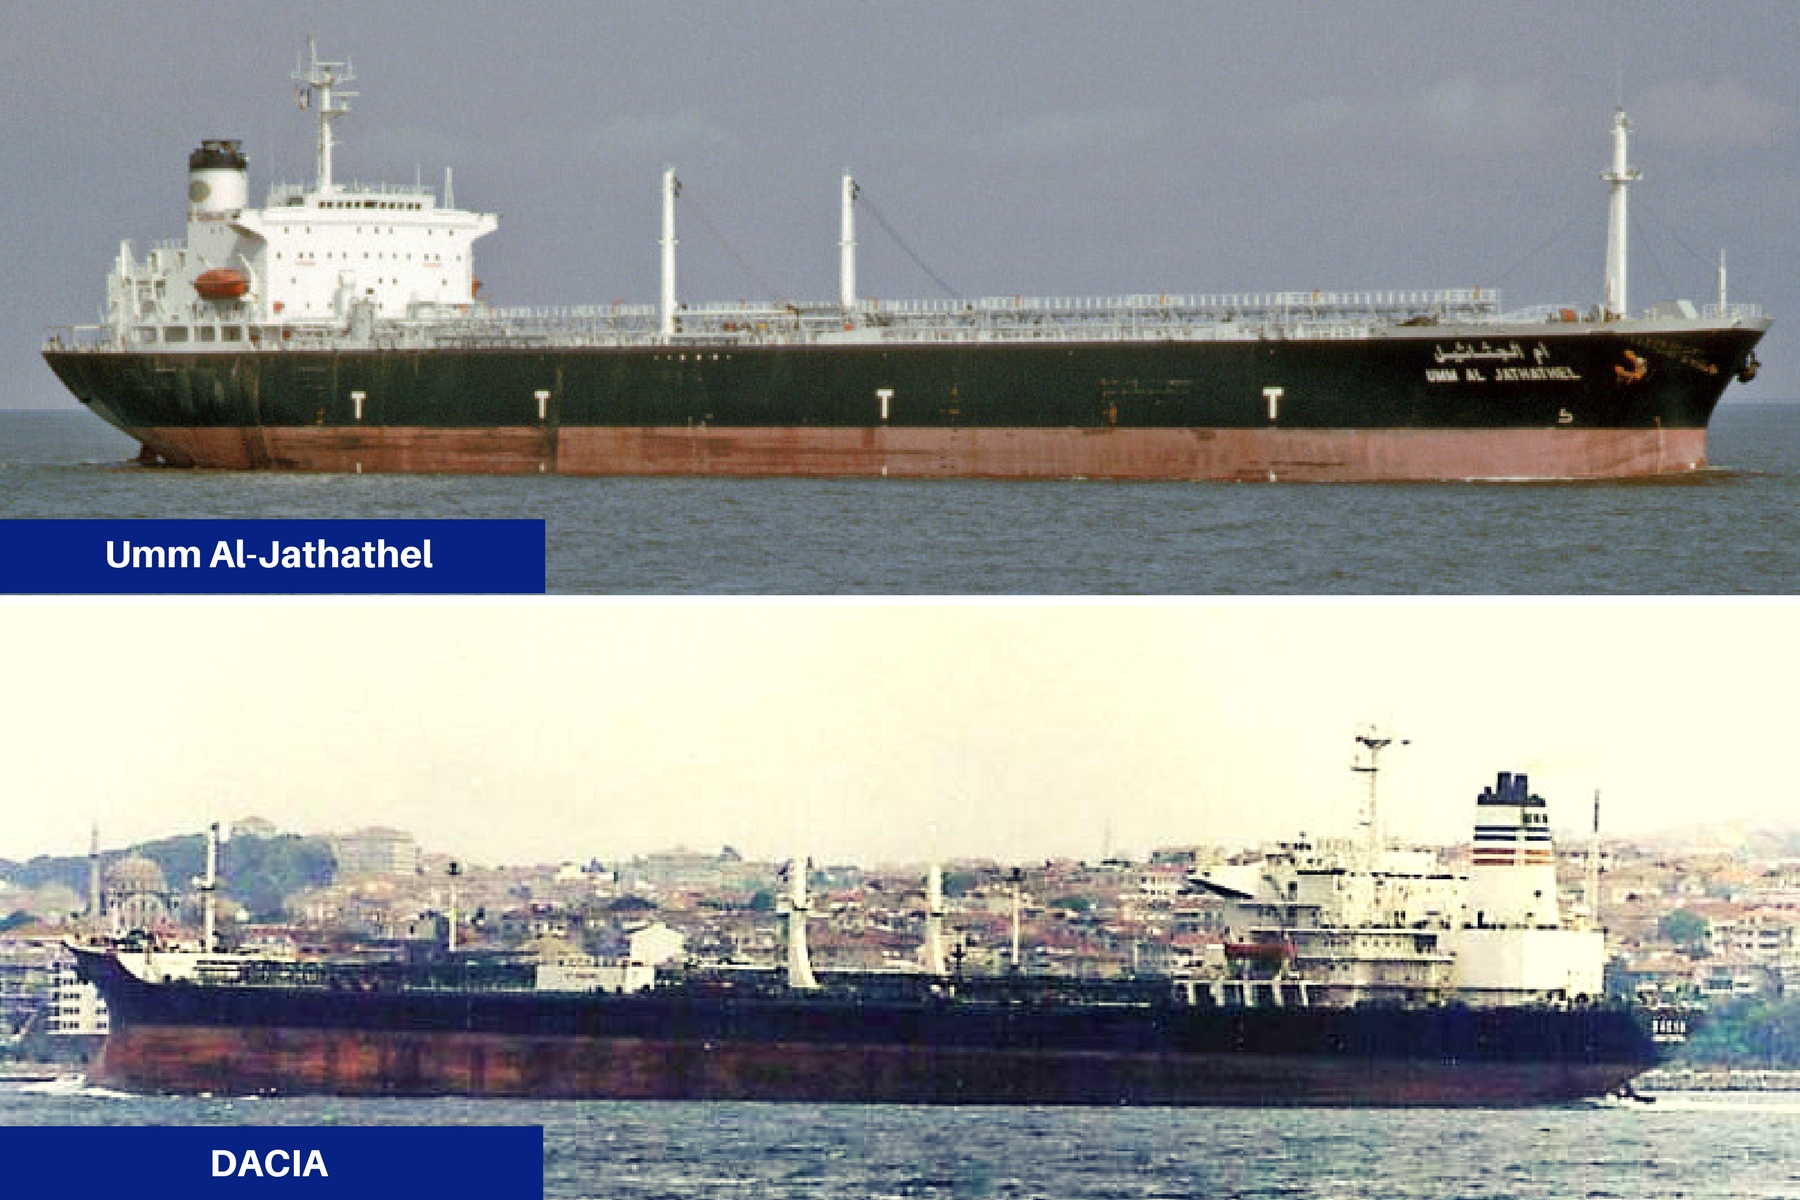 Tancurile petroliere Umm Al-Jathathel si DACIA